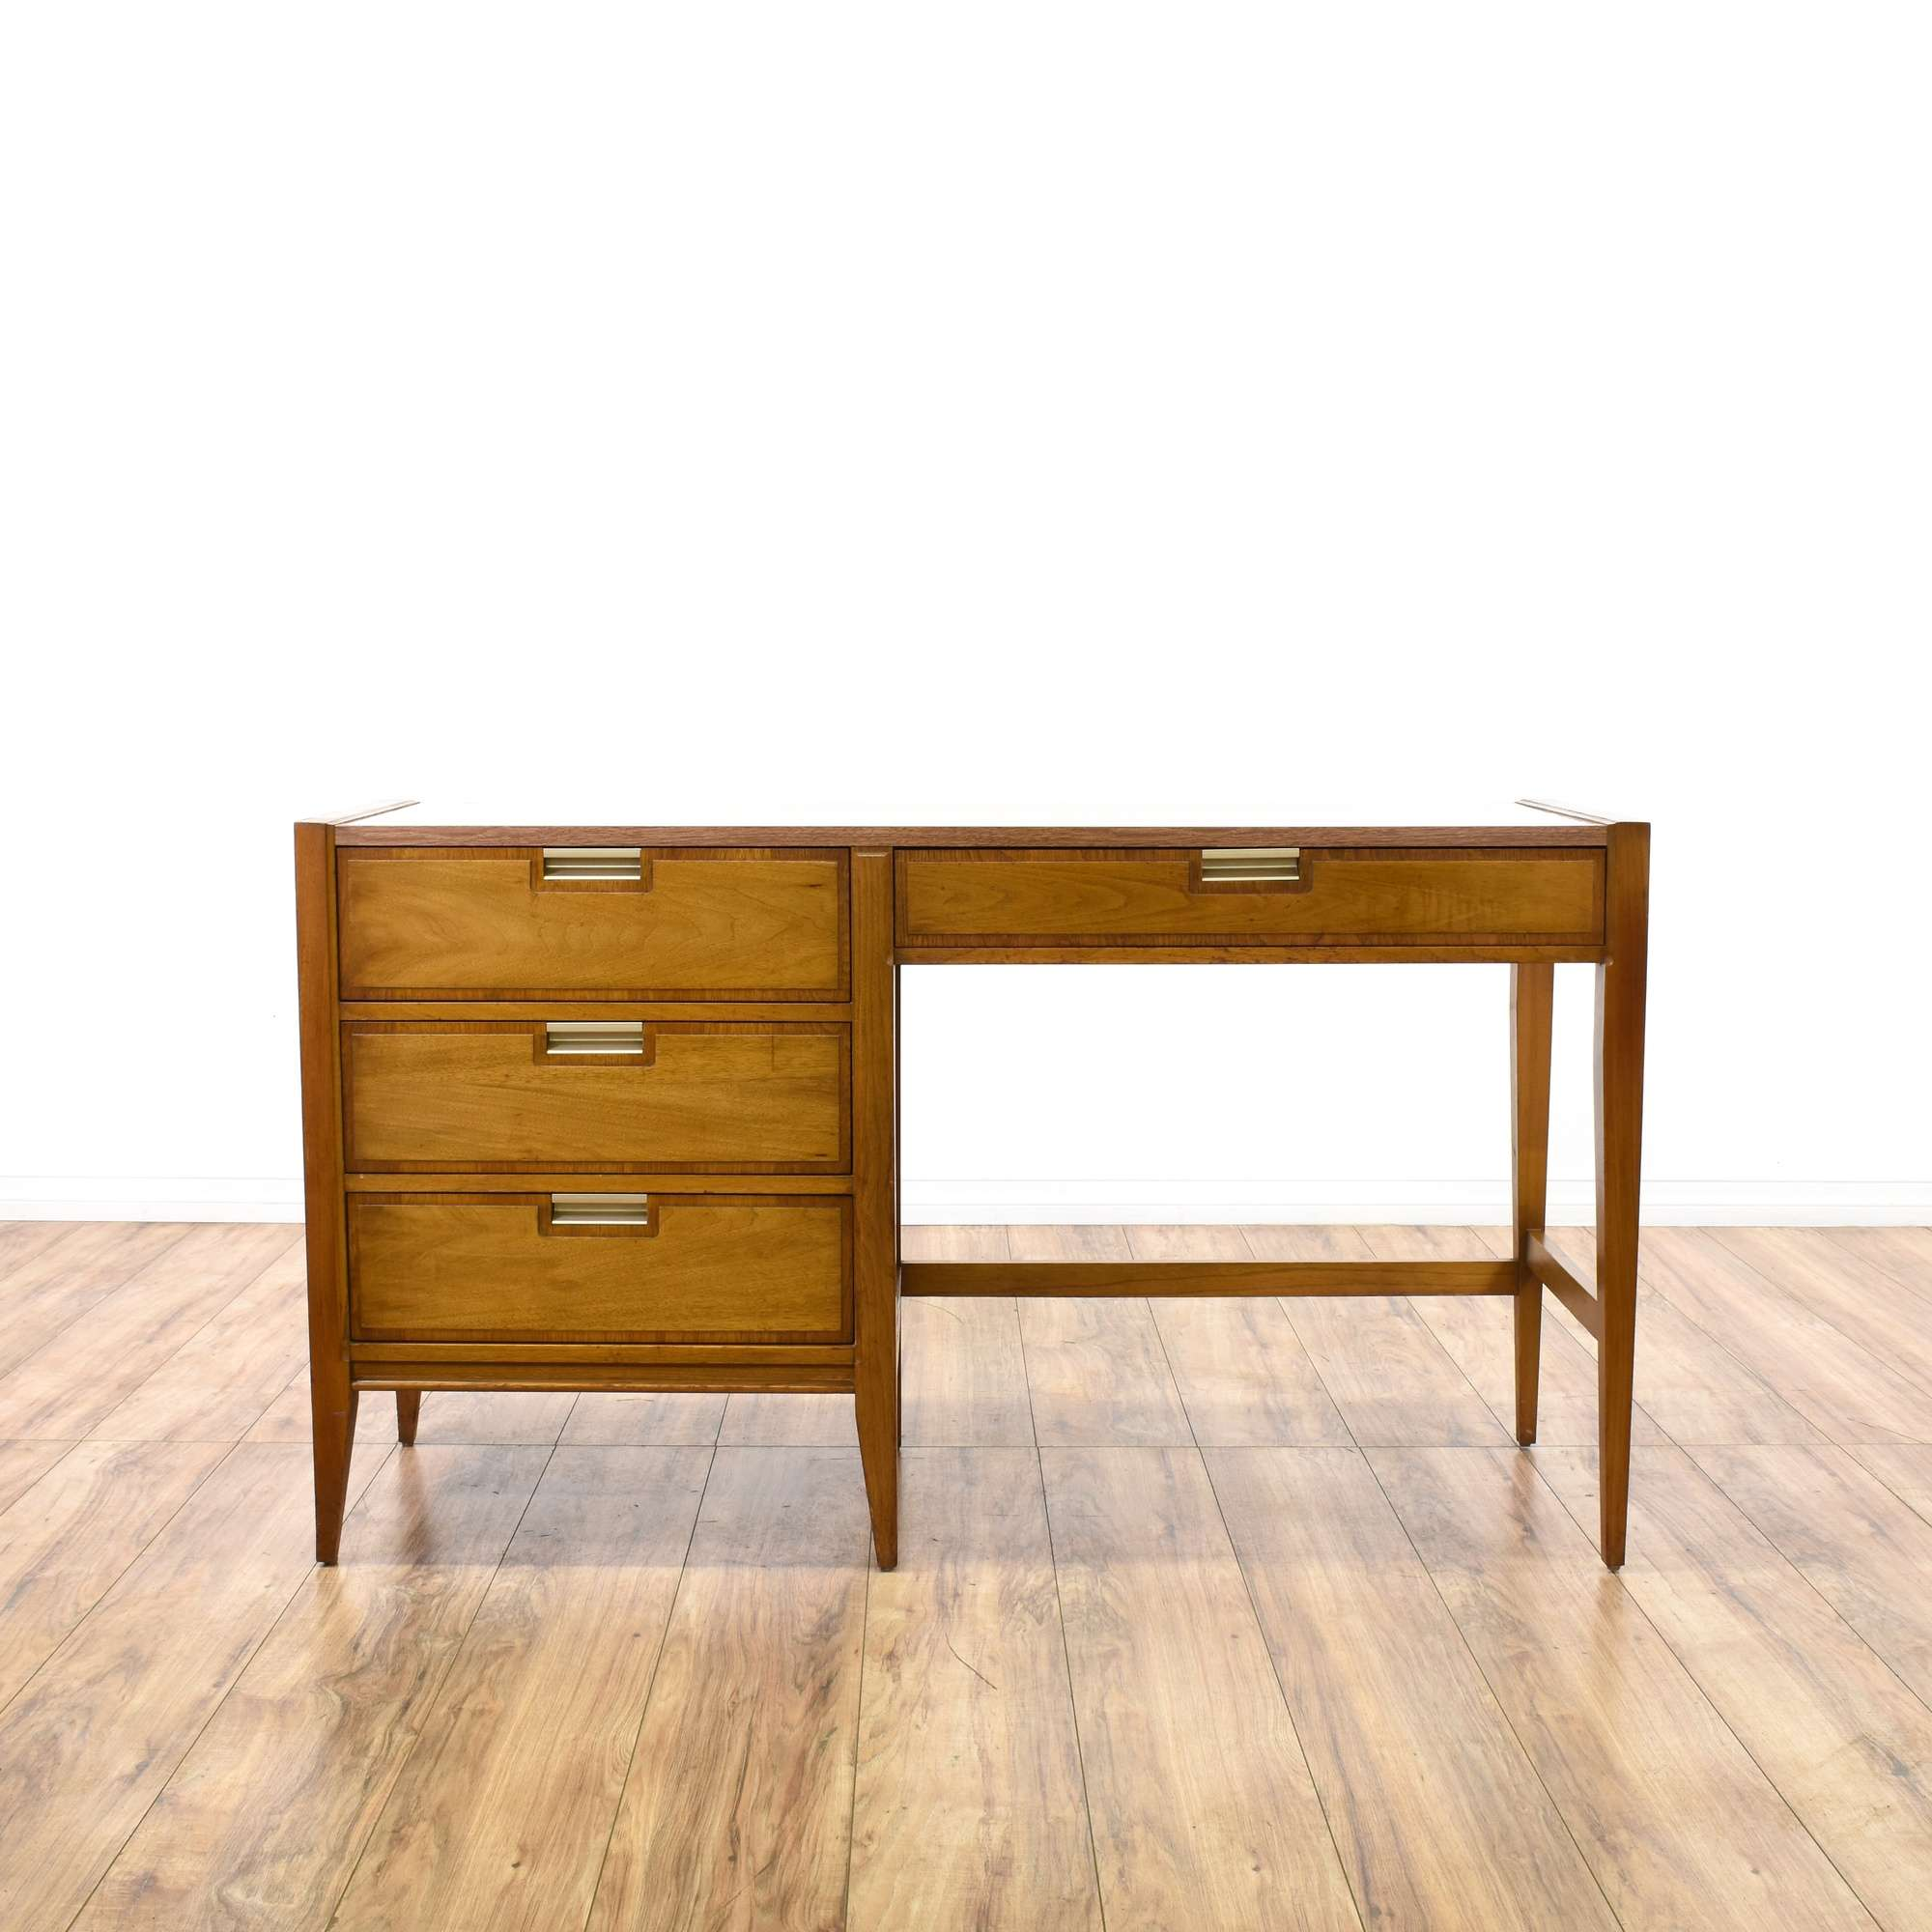 desks braakman extravagant desk modern unthinkable mid cees pastoe writing century allmodern by for